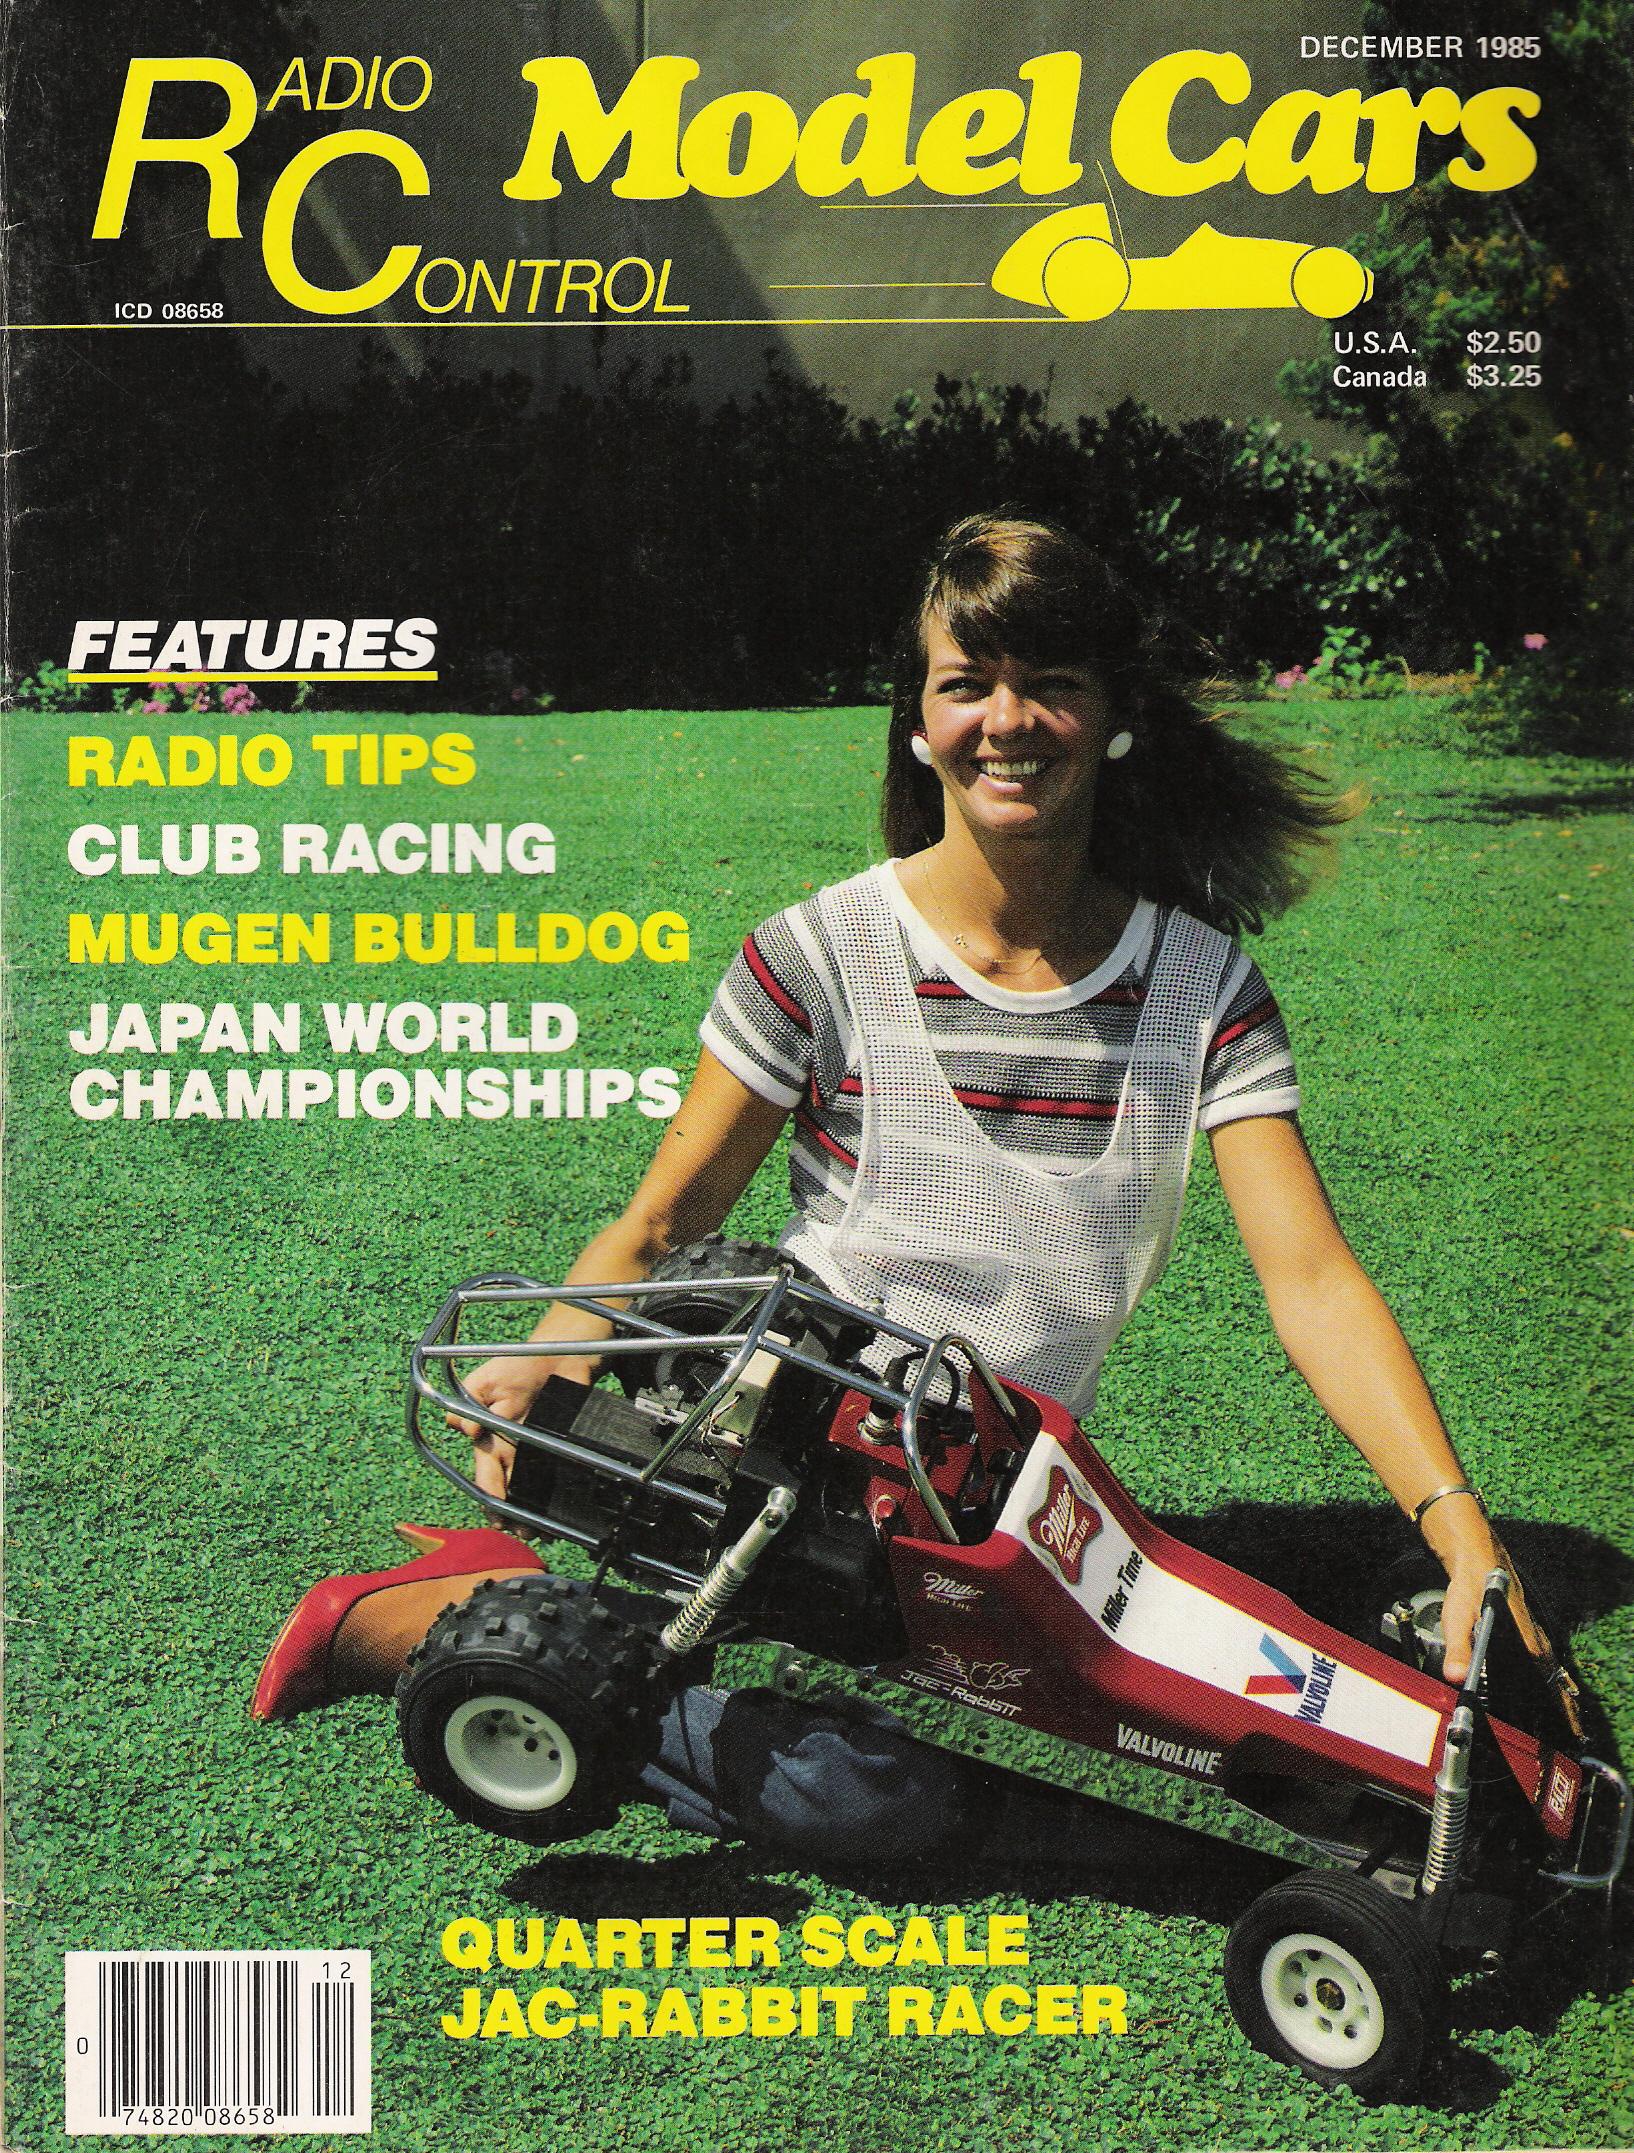 Radio Control Model Cars' December 1985 cover.